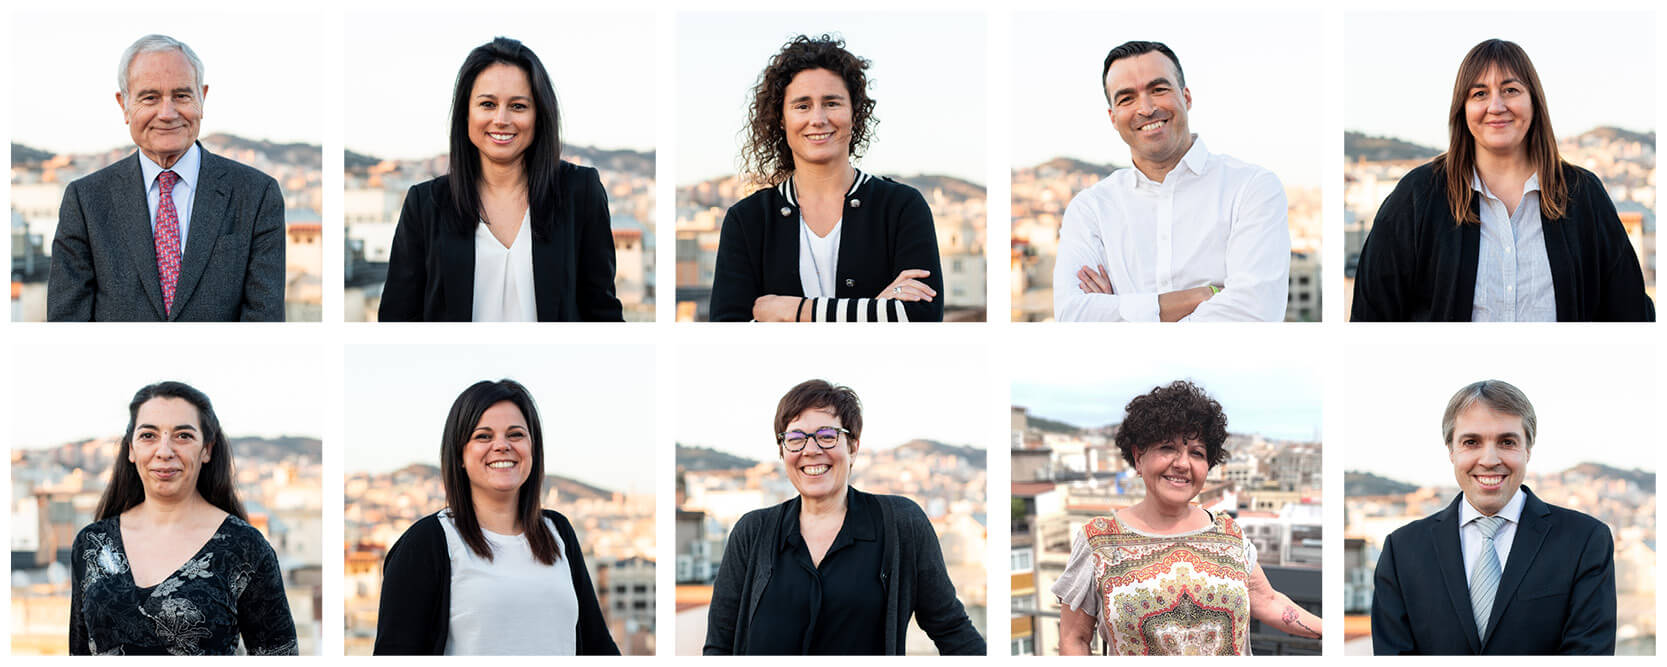 Equipo asesores inmobiliarios | Finques Marbà